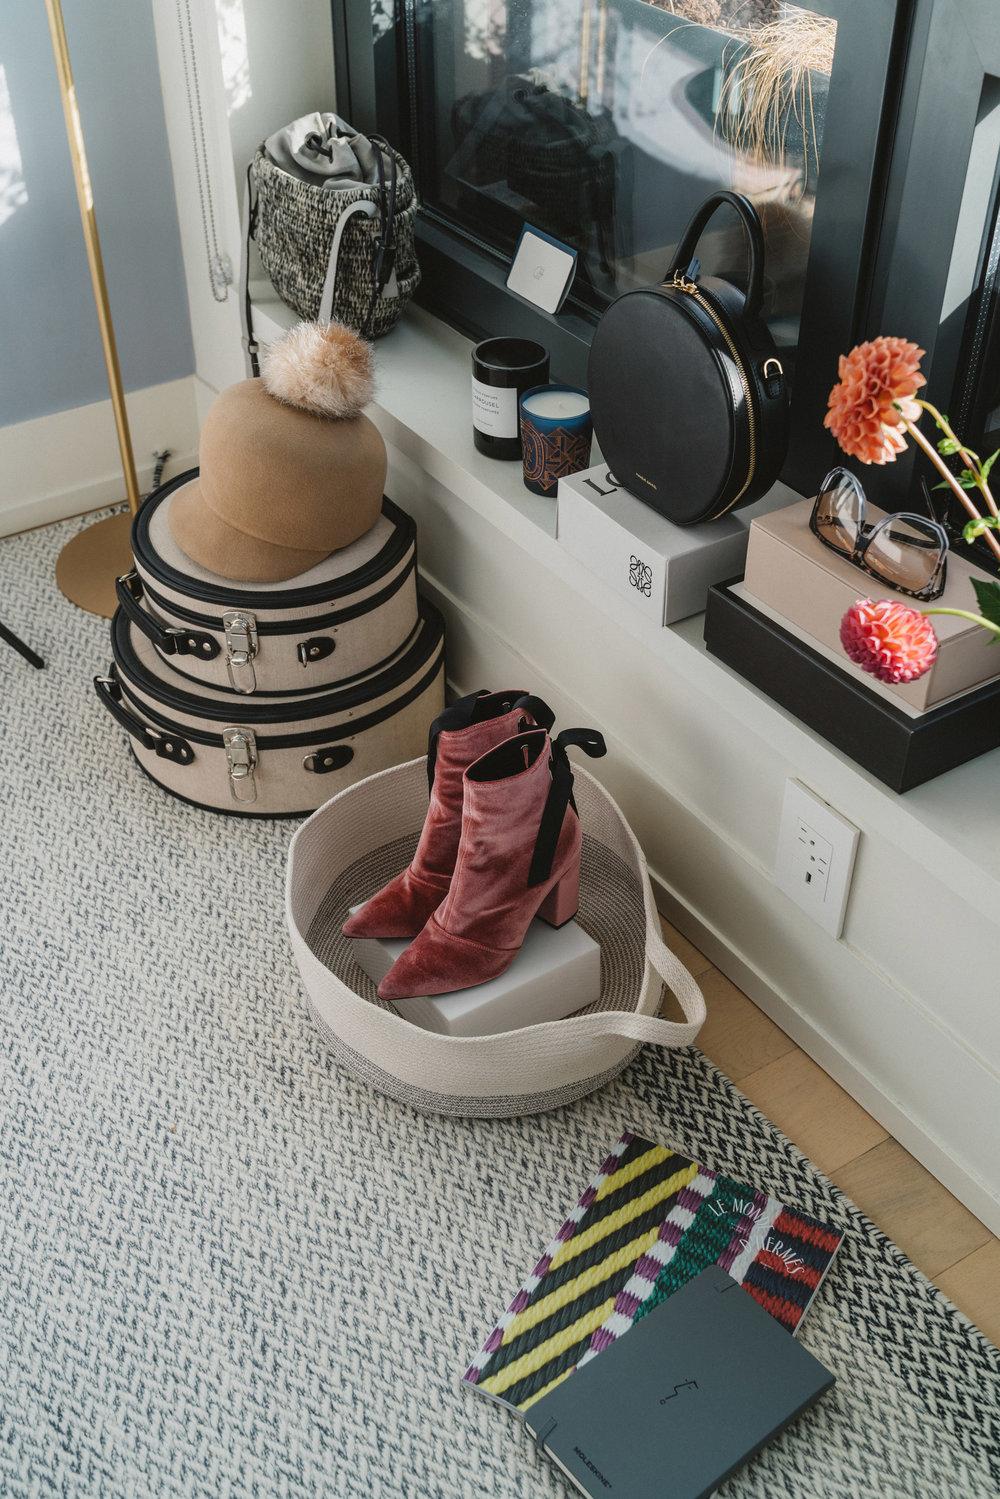 Muuto Rug ,  Khokho Bag ,  Lola Hats Hat ,  Steamline Luggage Hatbox ,  Byredo Candle ,  Diptyque Candle ,  Mansur Gavriel Bag ,  Robert Clergerie Boots ,  Jason Wu Moleskin